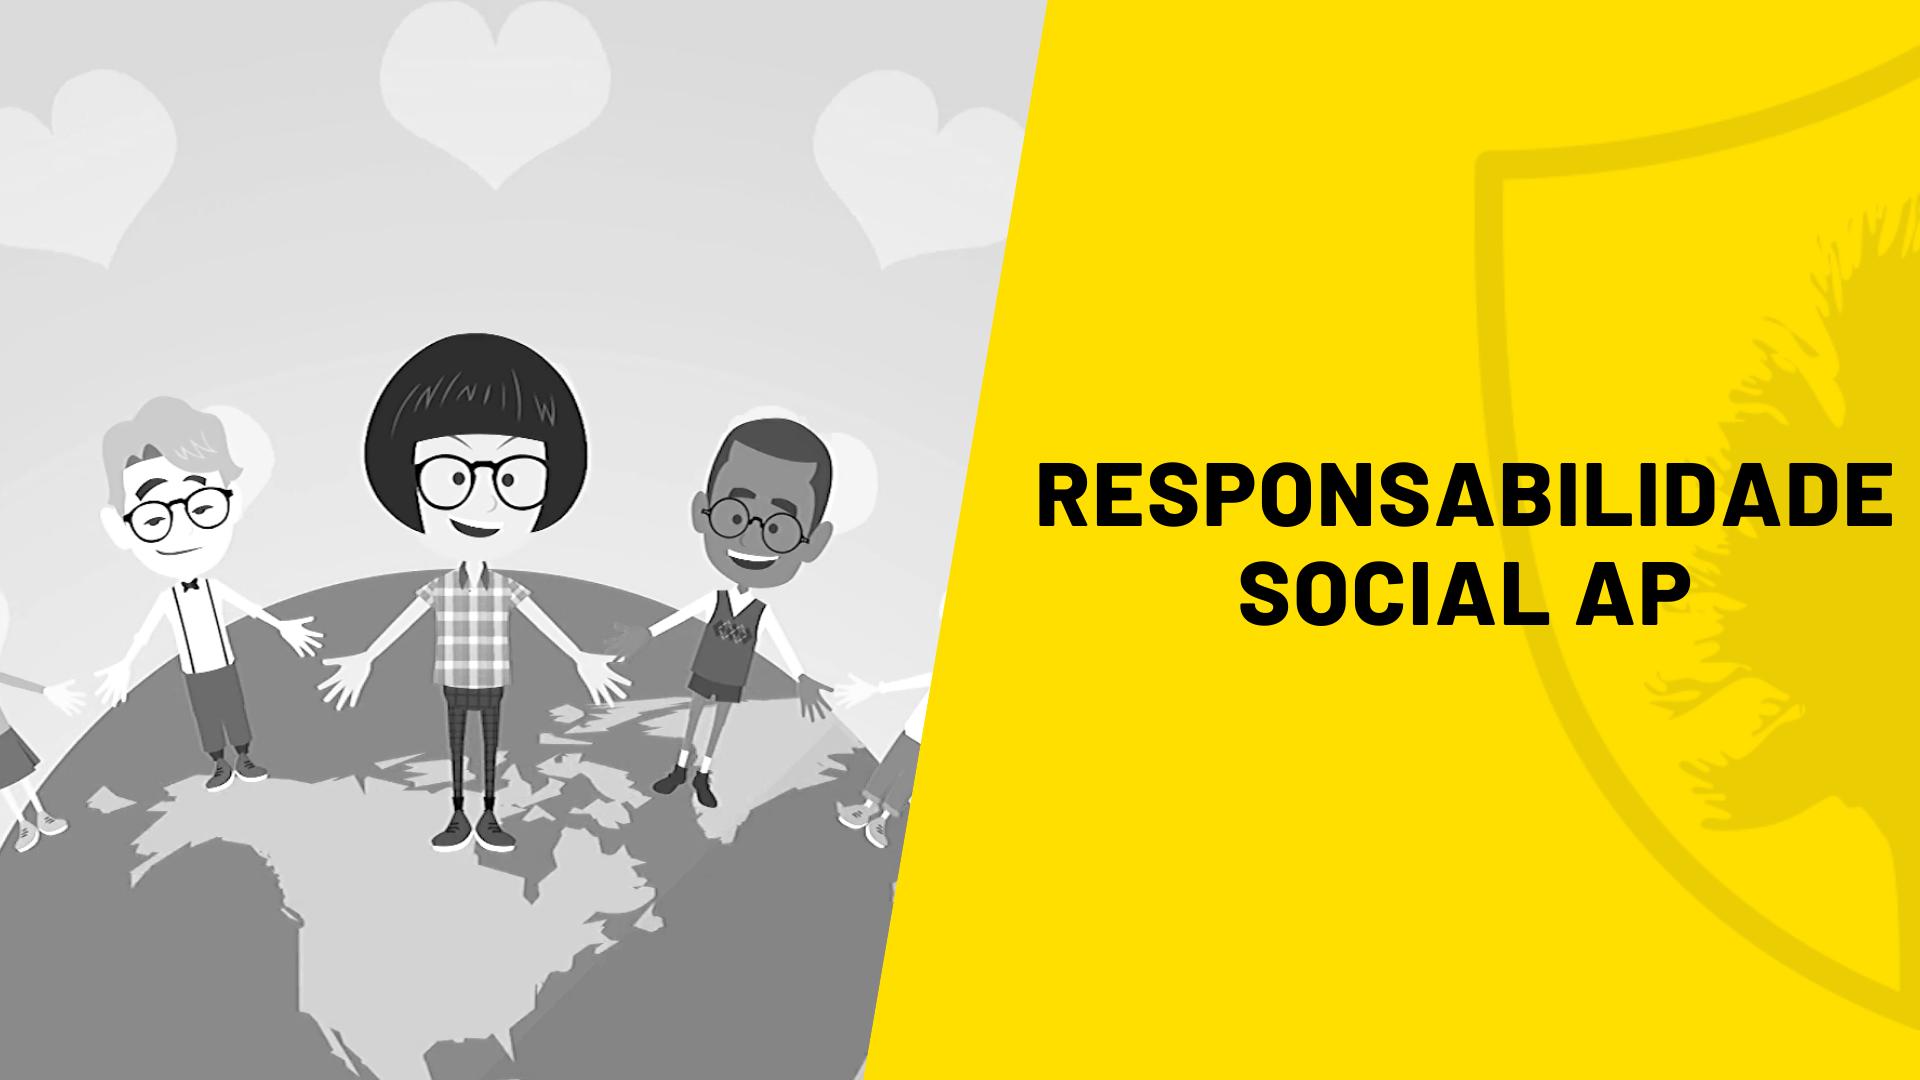 Responsabilidade Social - AP Portugal - Abia Digital-1